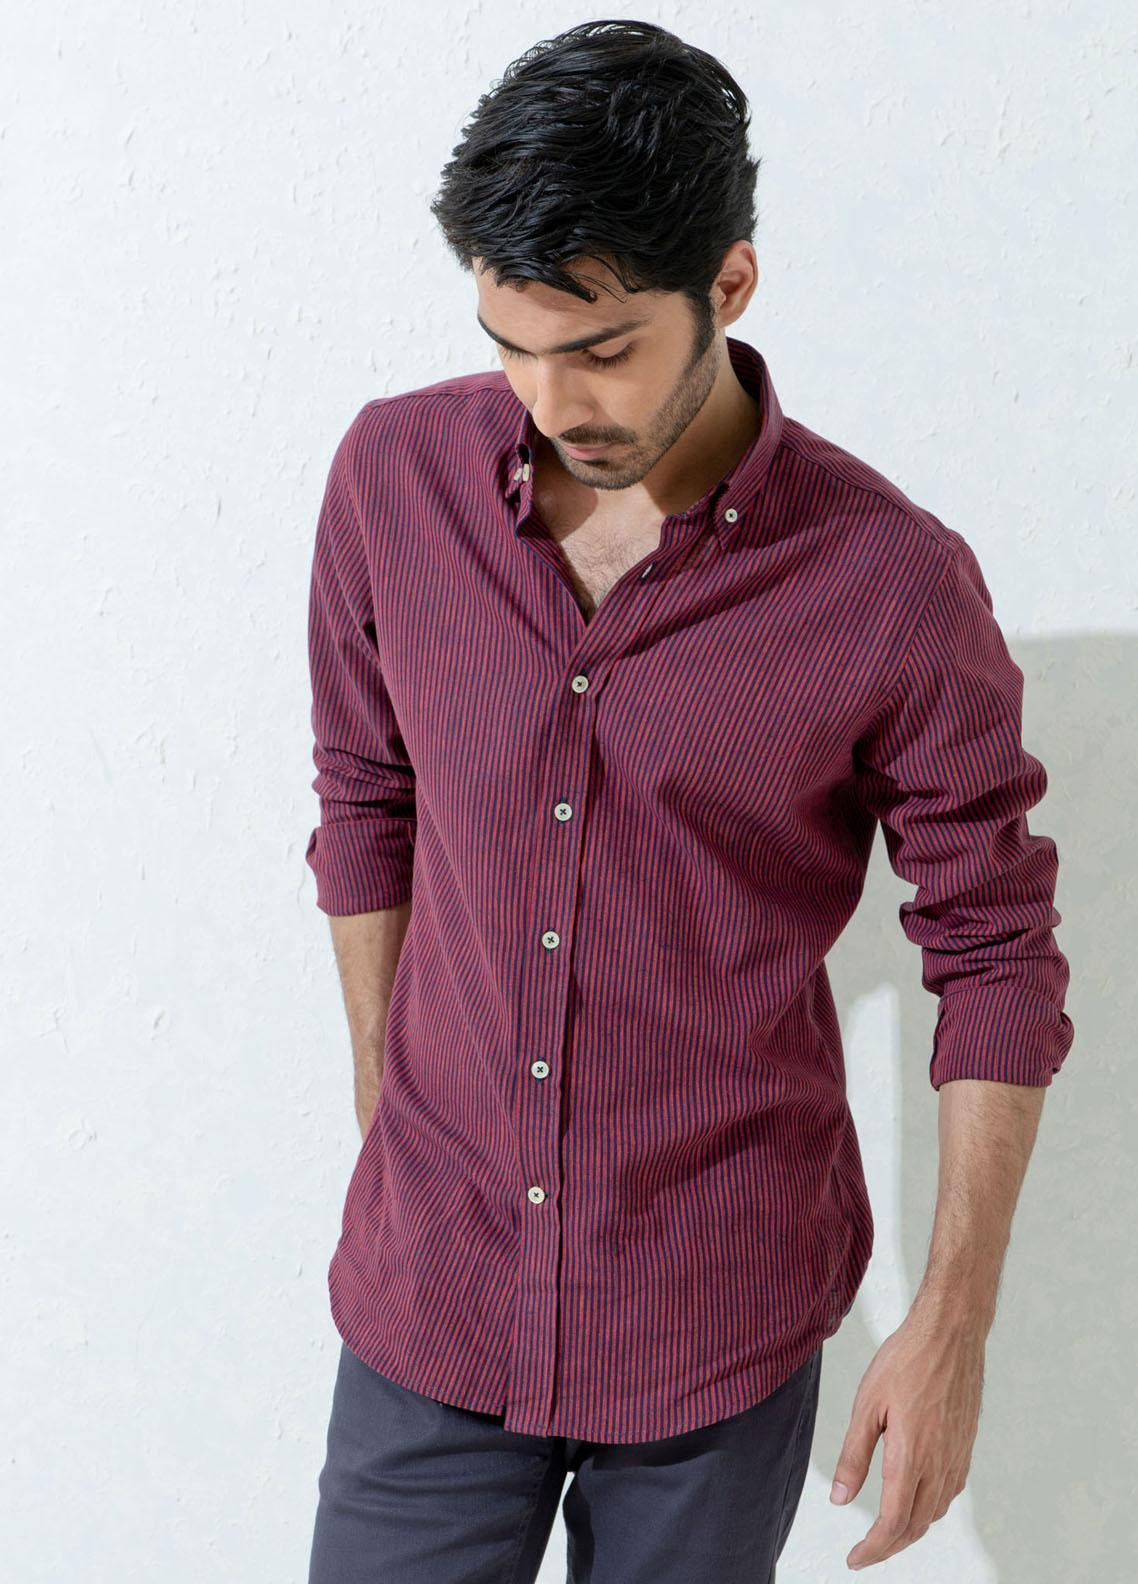 Brumano Cotton Casual Men Shirts -  Maroon & Navy Striped Linen